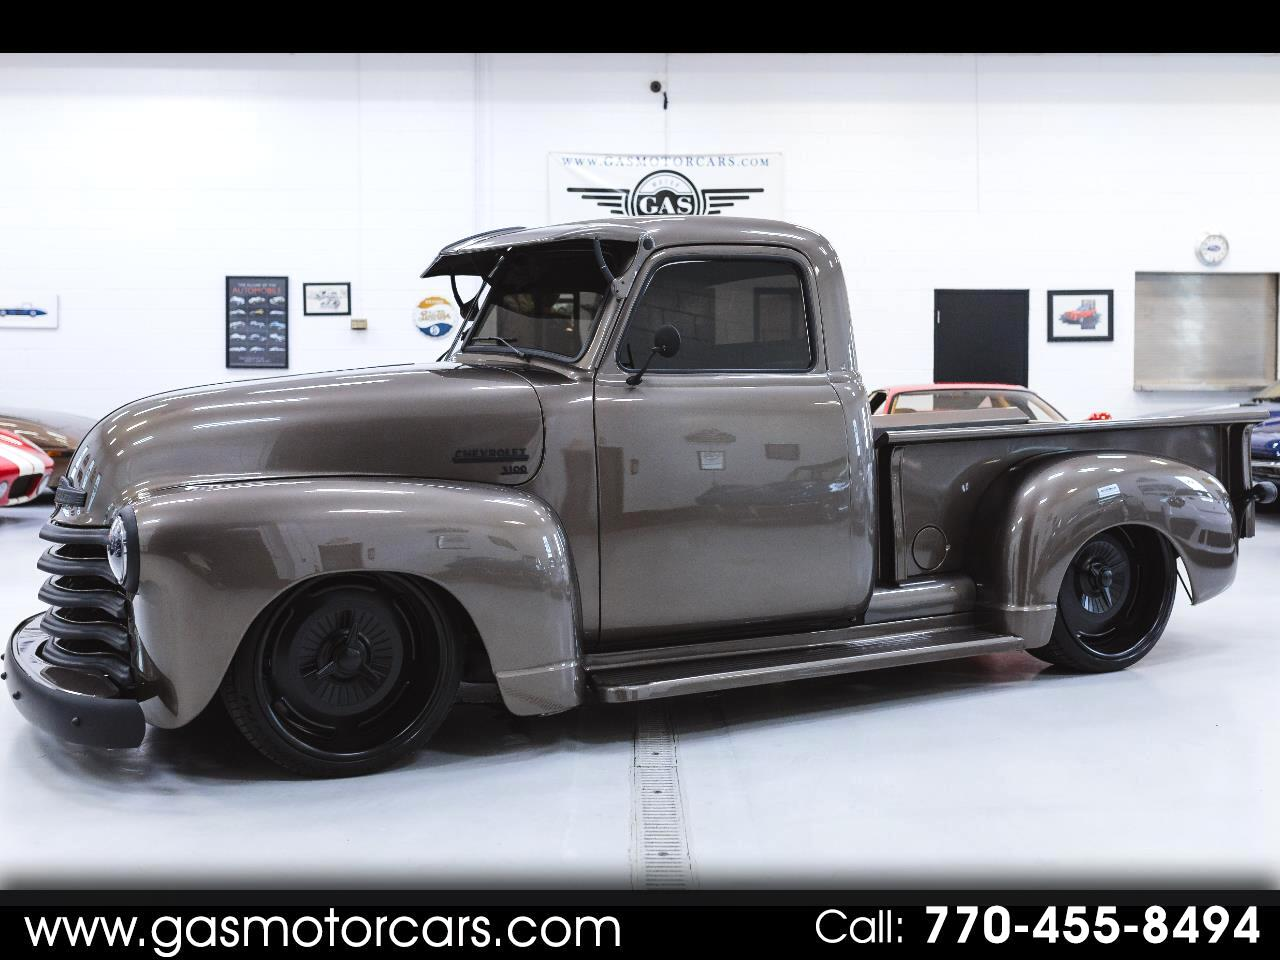 1949 Chevrolet 3100 Truck